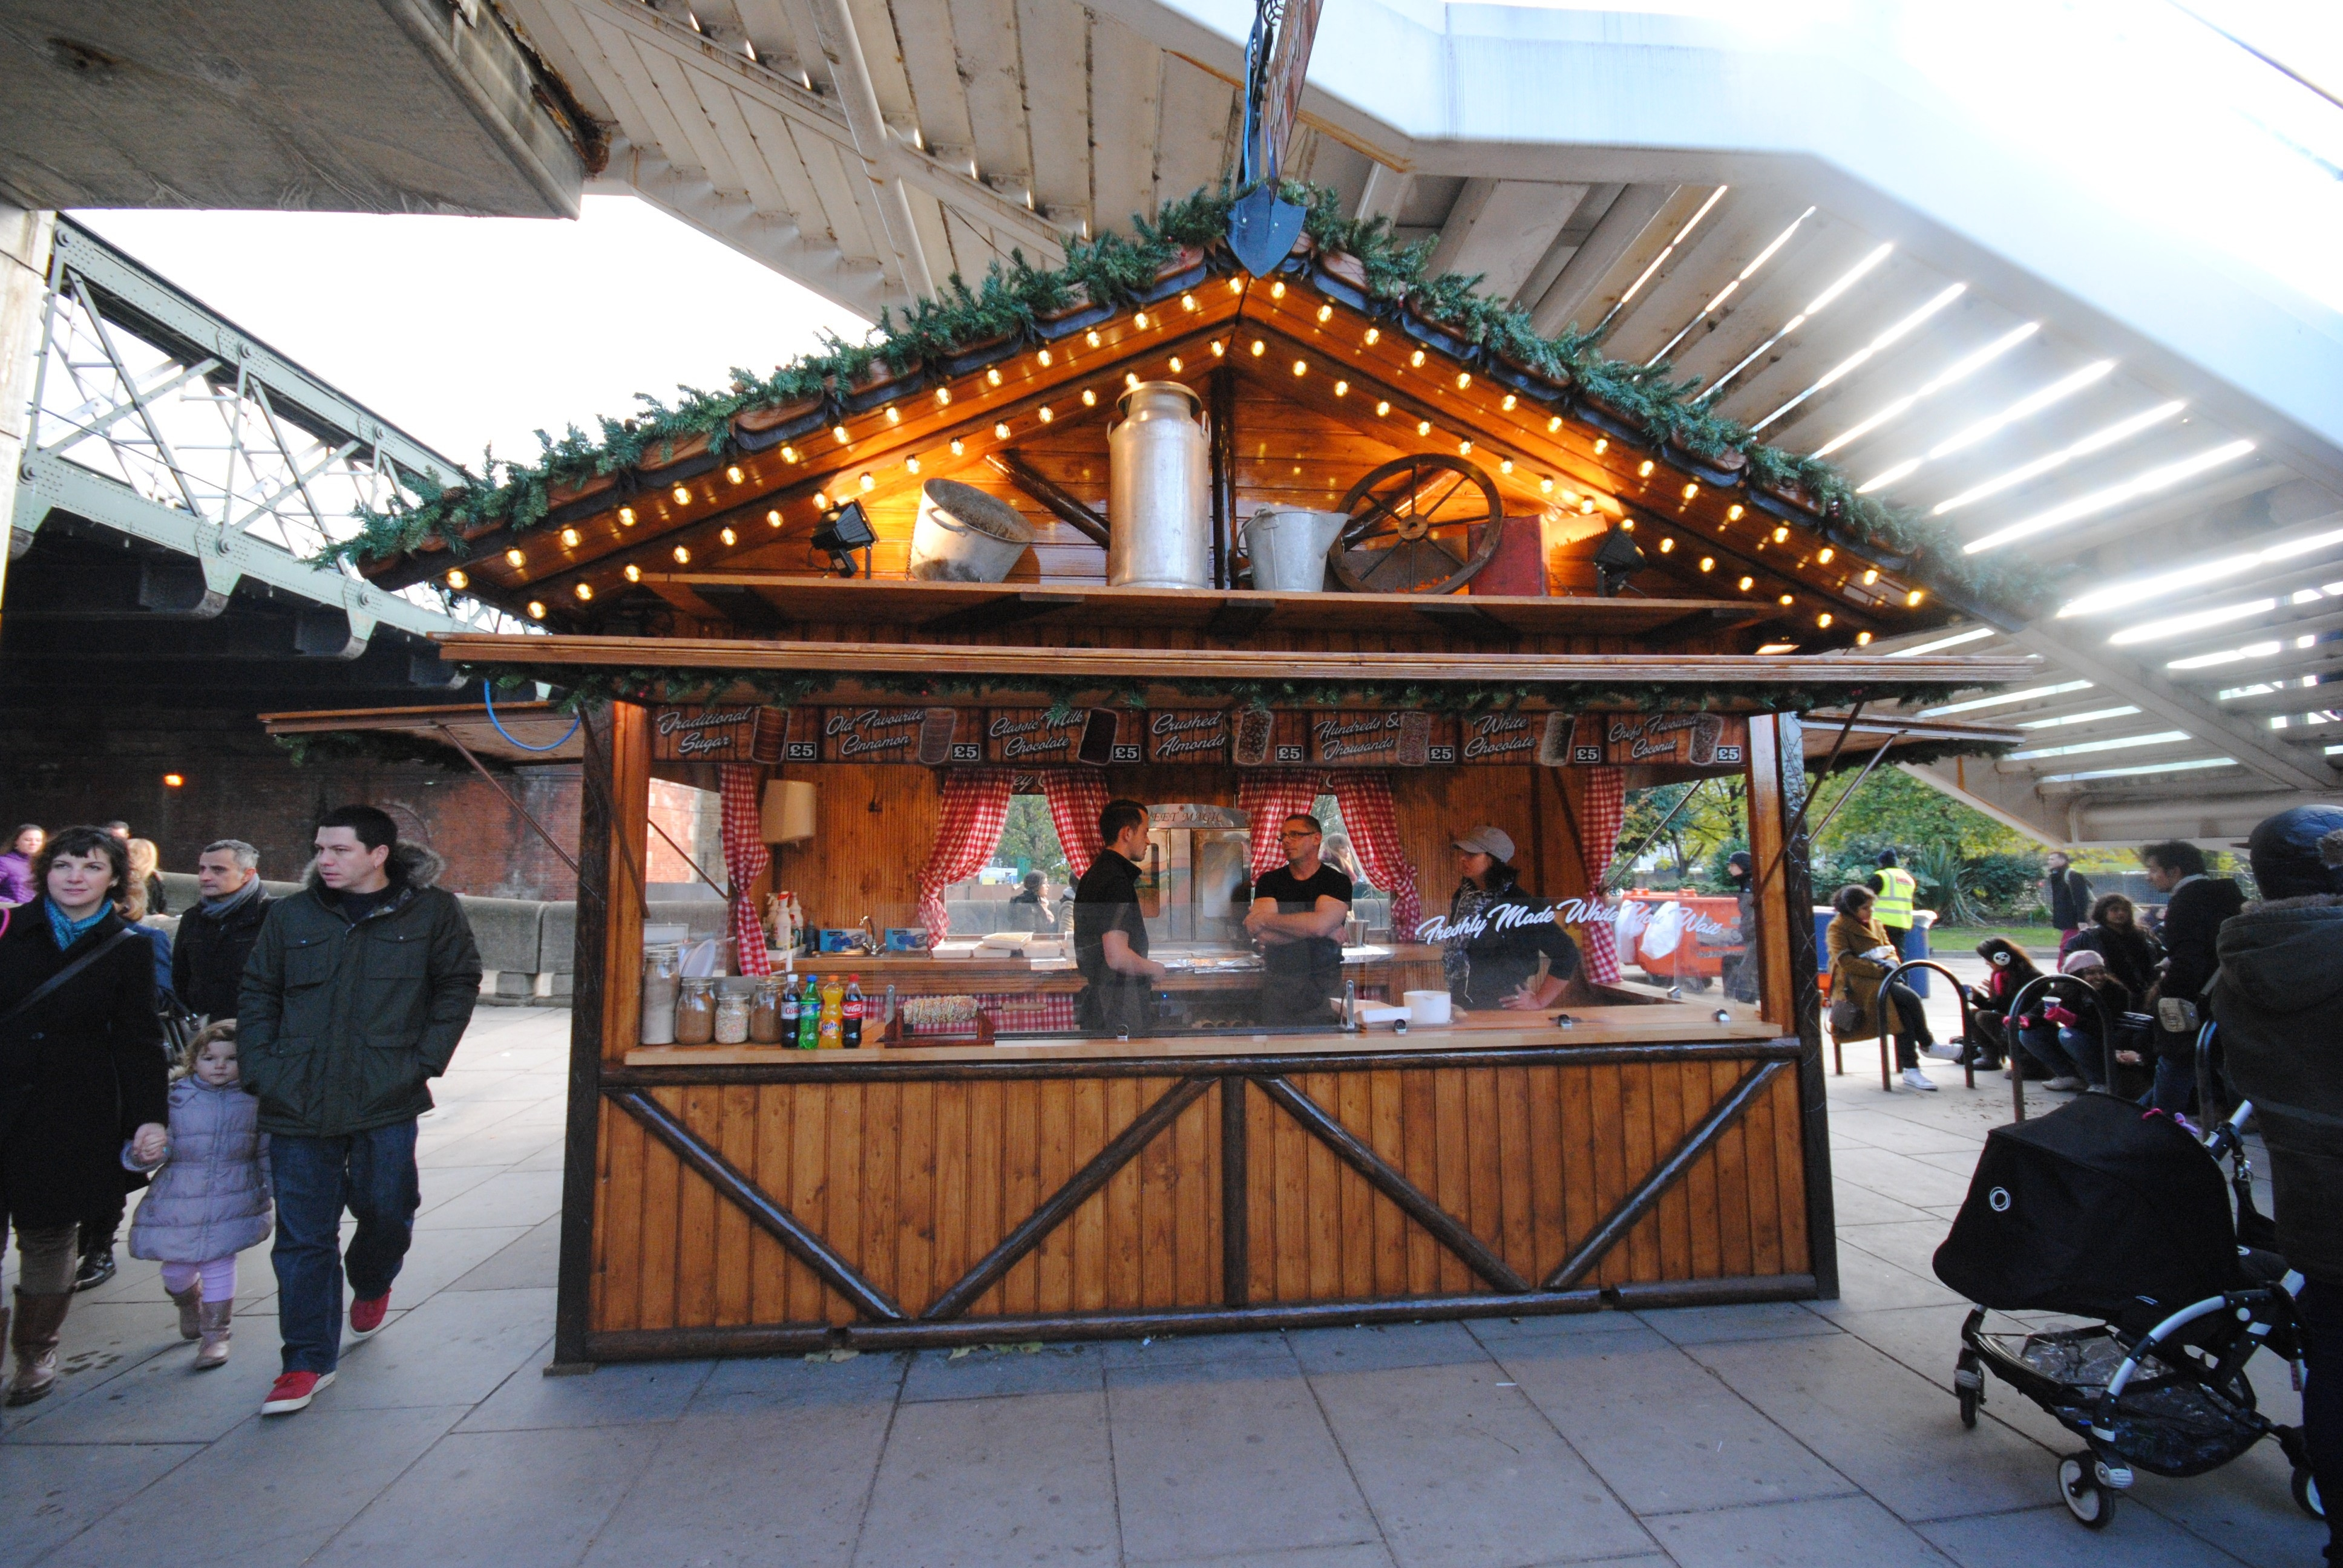 Southbank Christmas Market London